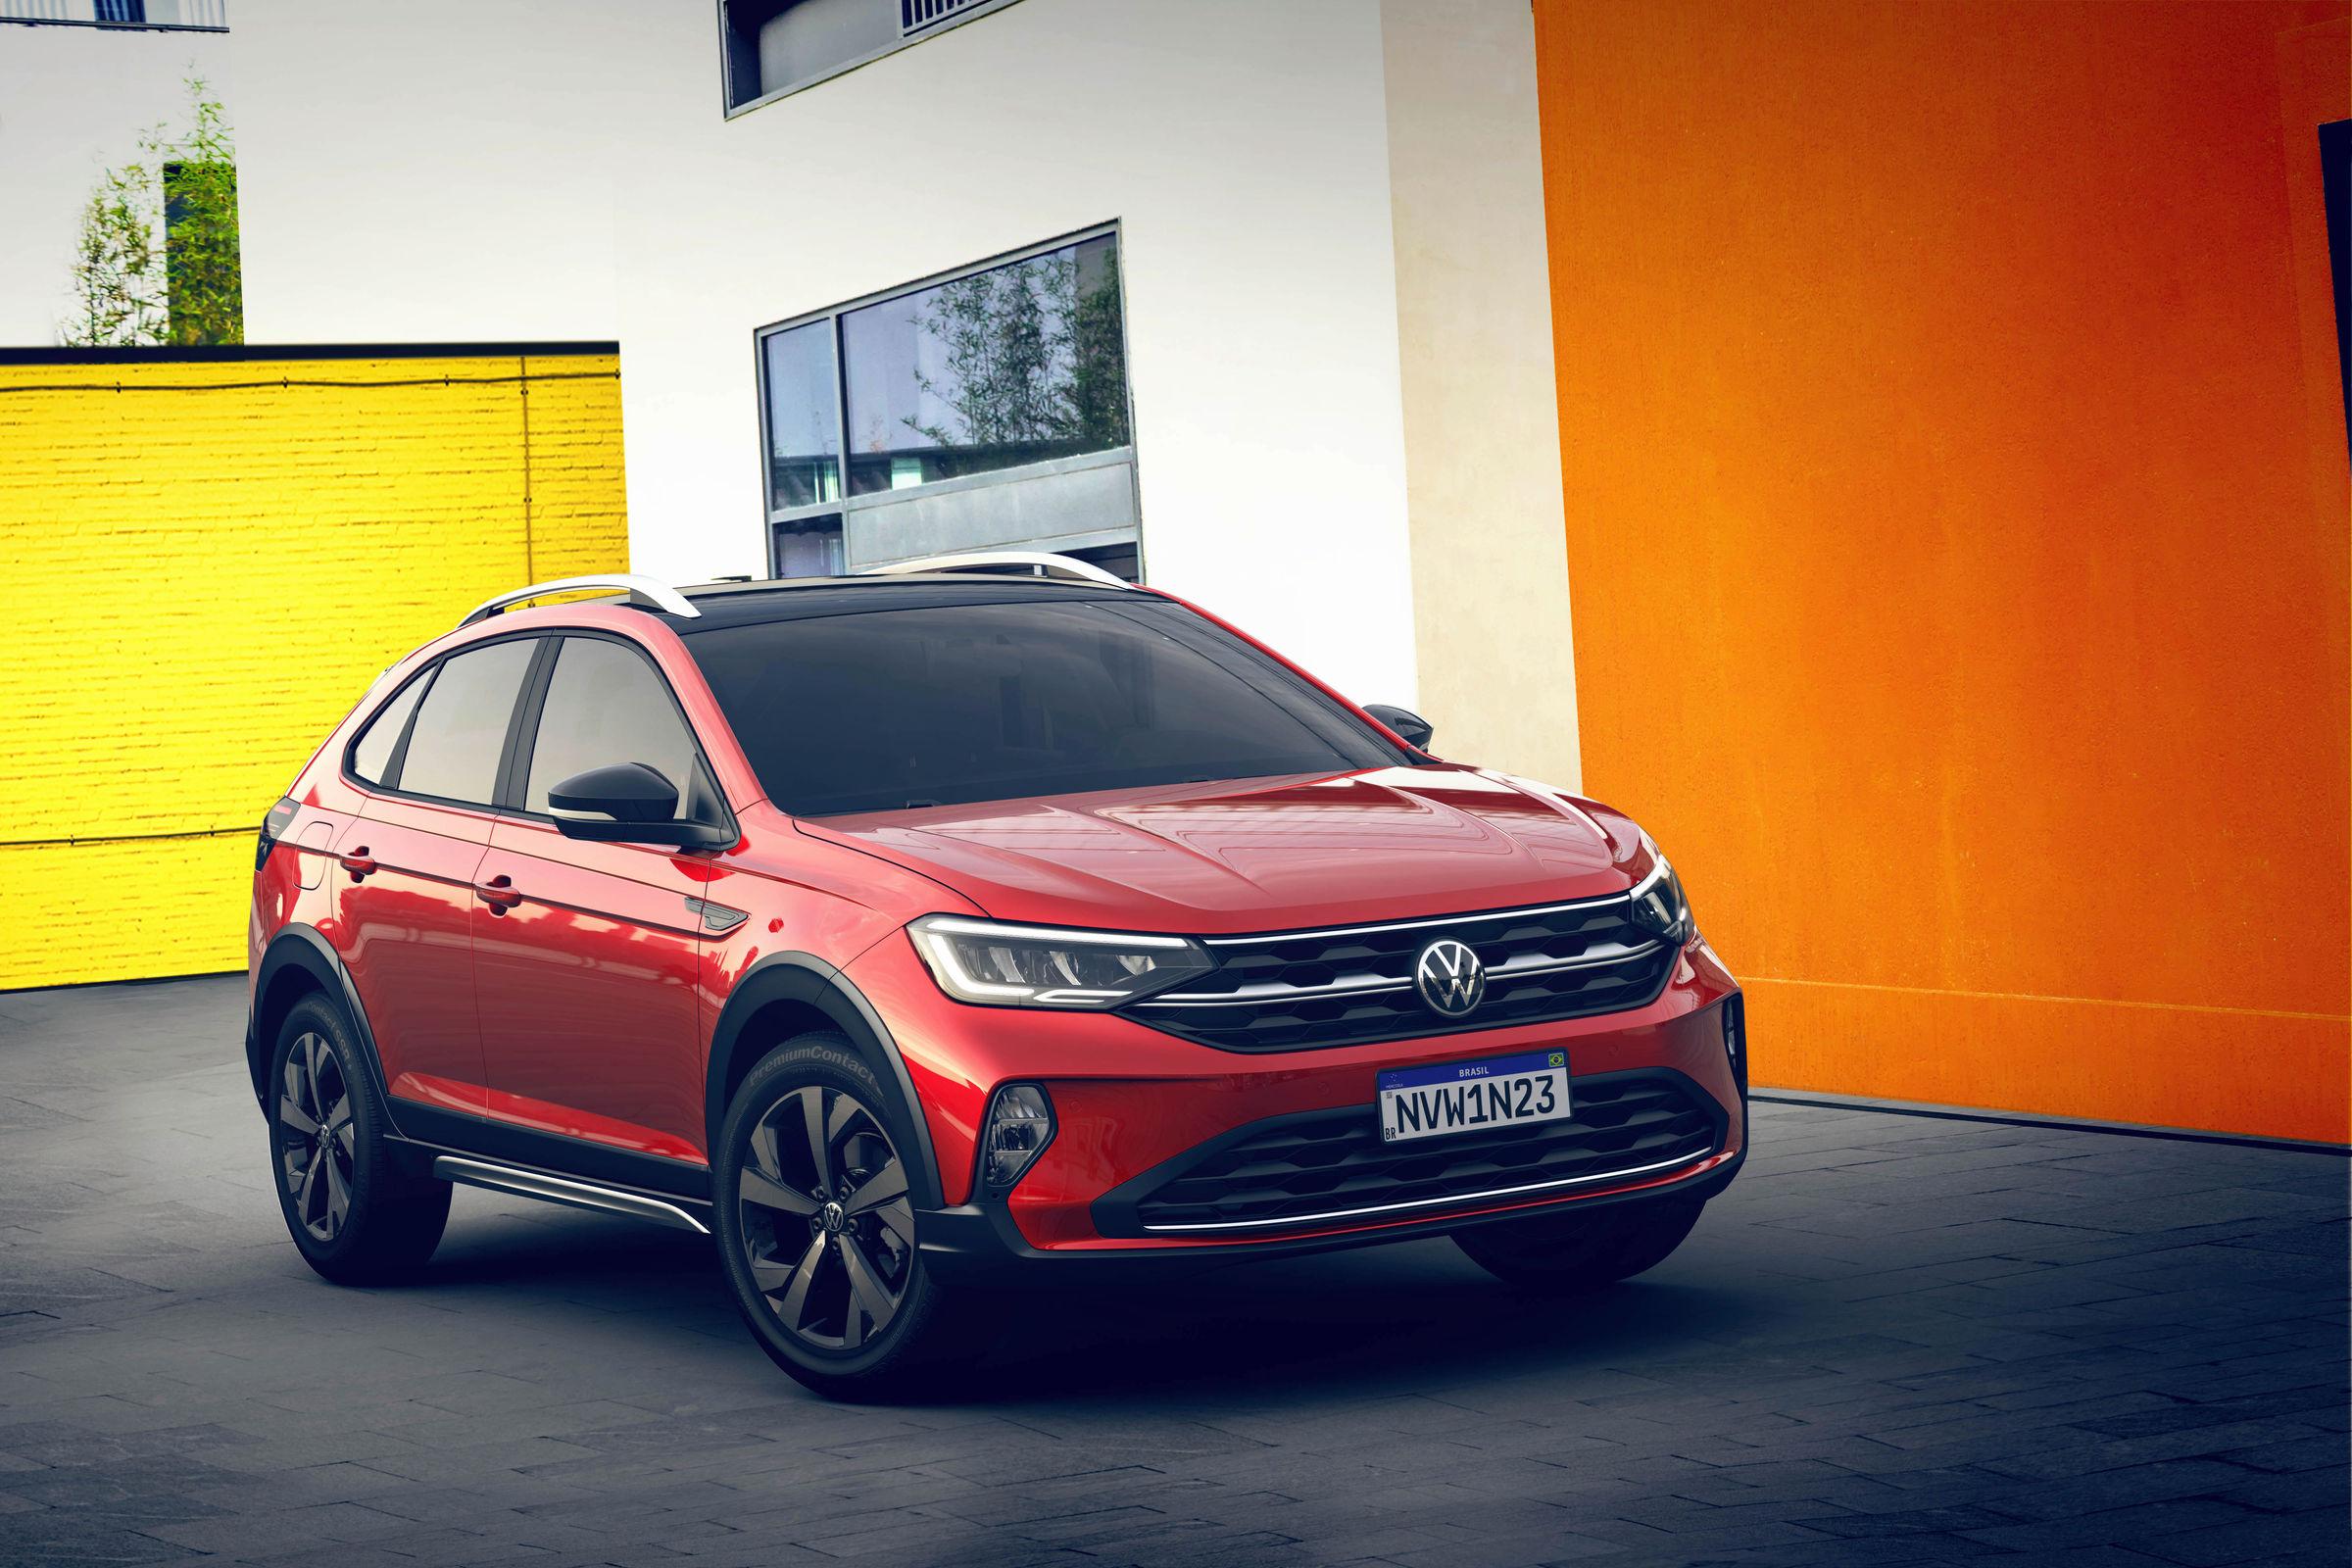 Volkswagen Nivus llegará a México el primer semestre del 2021